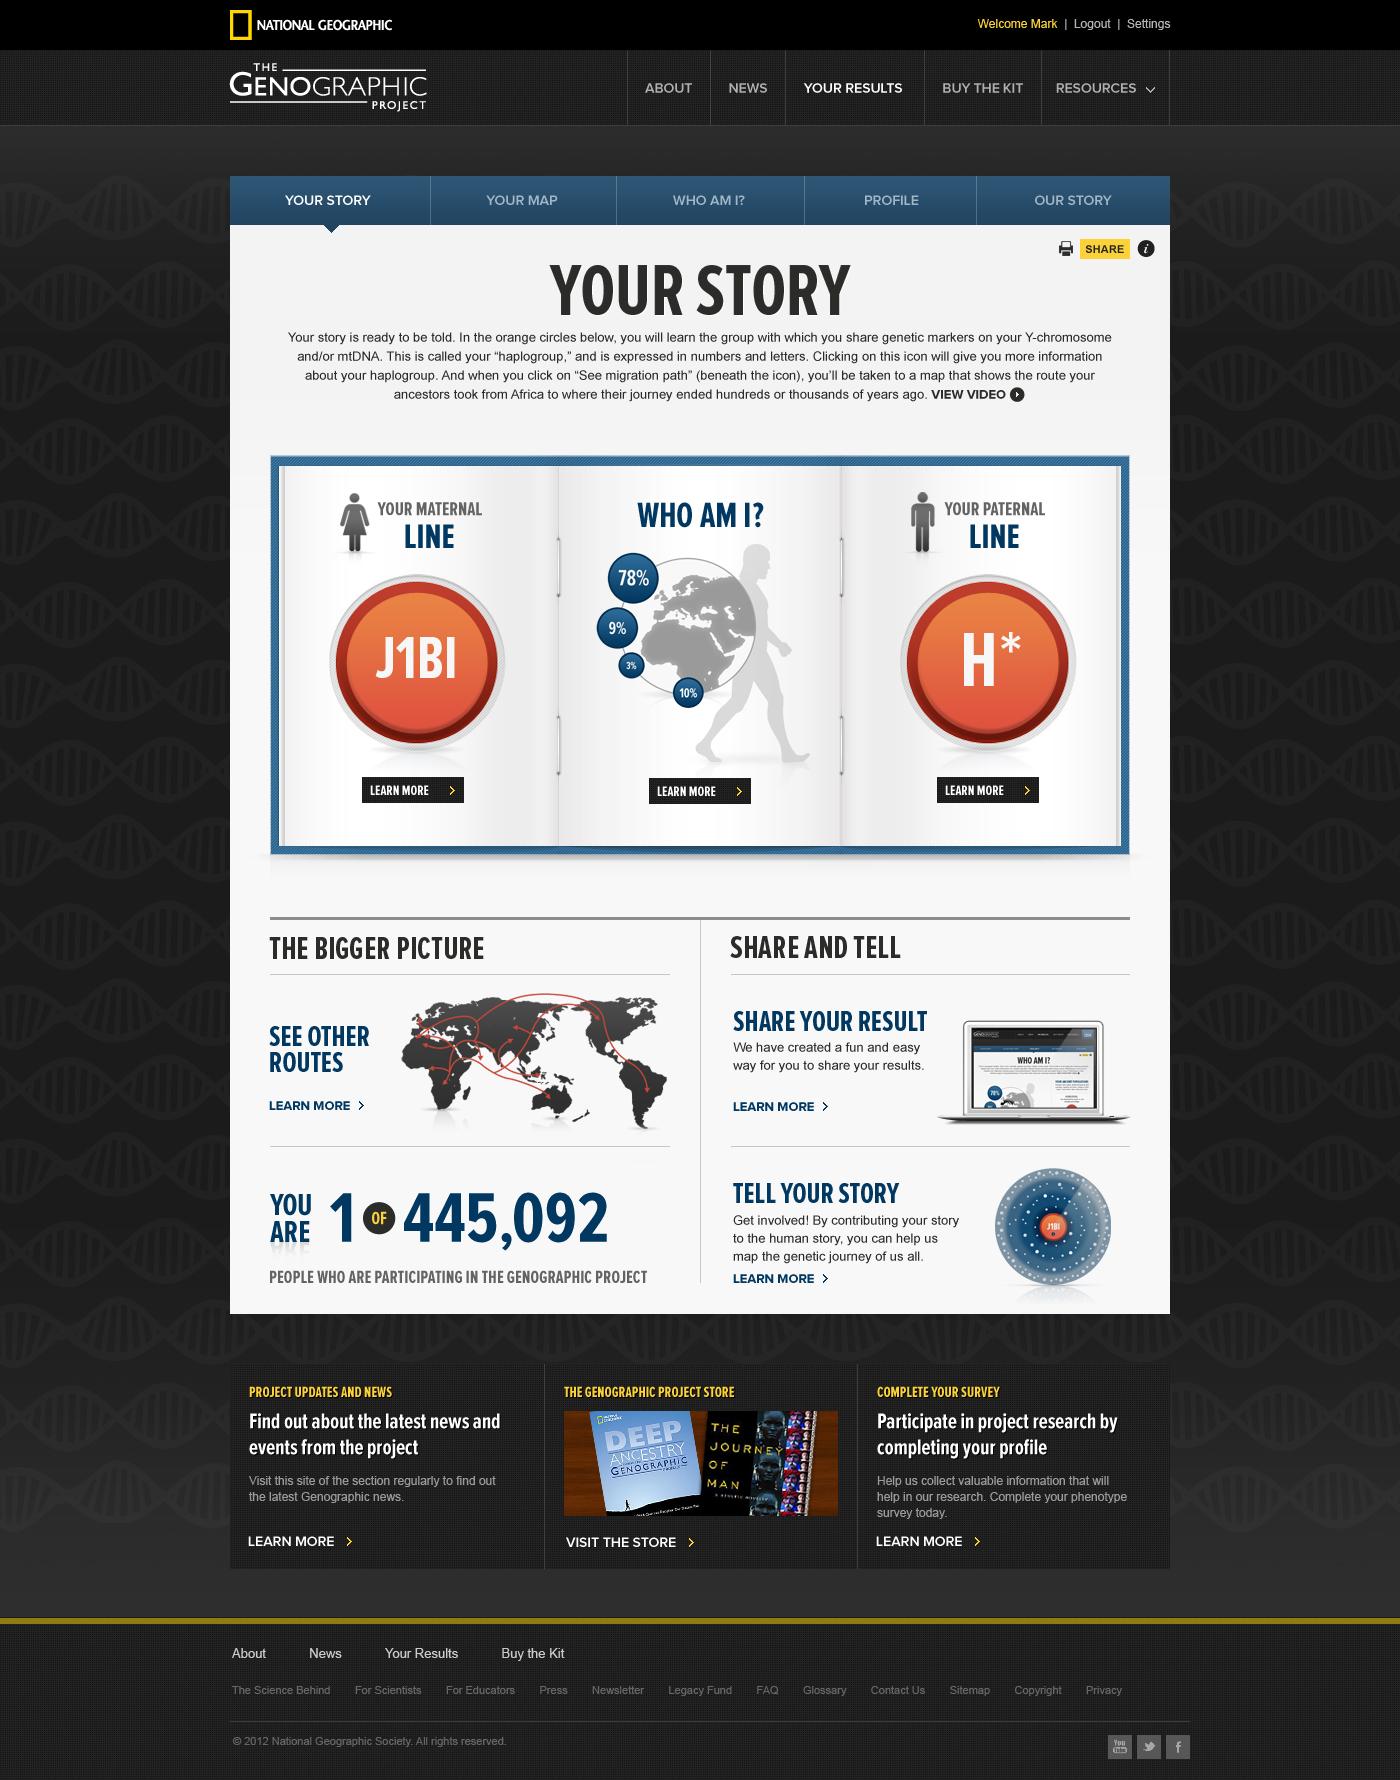 2012-07-31-results_yourstory_mainpane.jpg